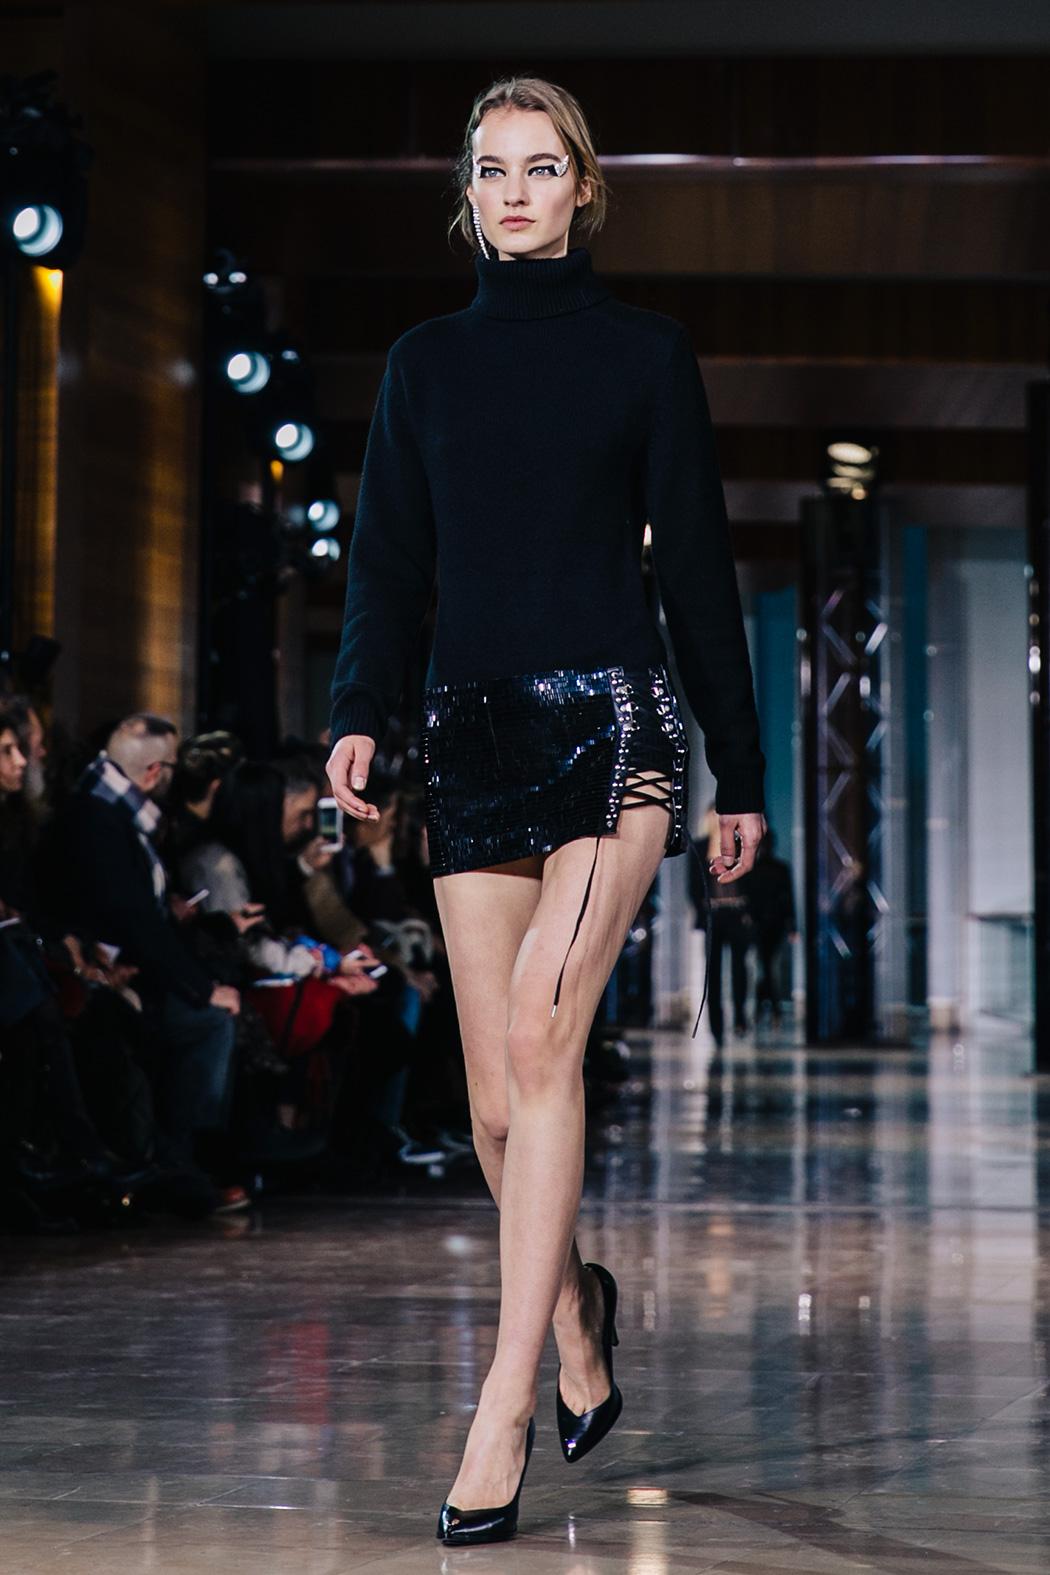 Paris_Fashion_Week-PFW-Anthony_Vaccarello_Fall_2016-Runway-8